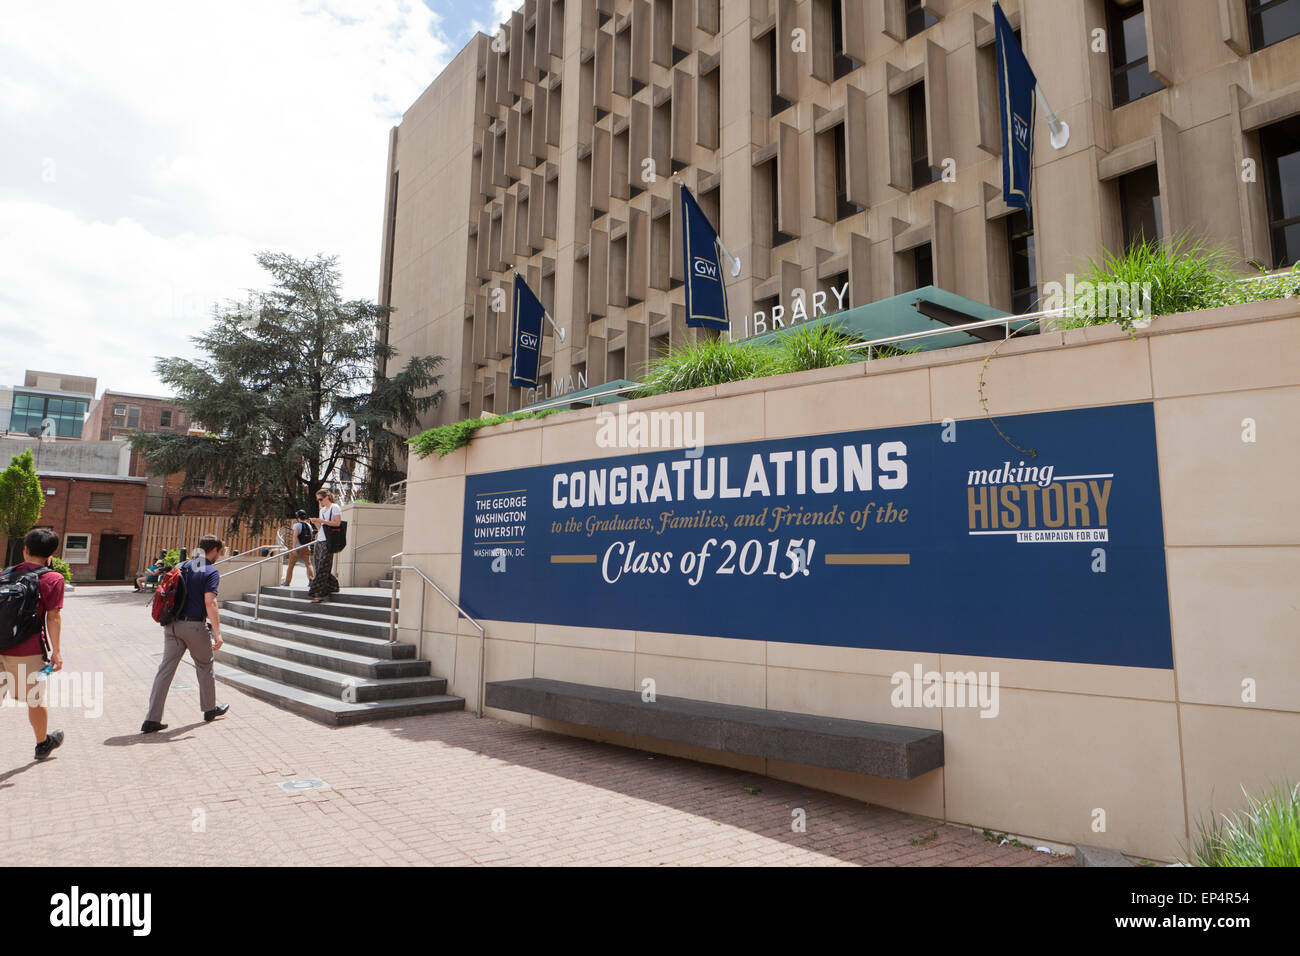 Congratulations sign for graduating class of 2015, George Washington University - Washington, DC USA - Stock Image